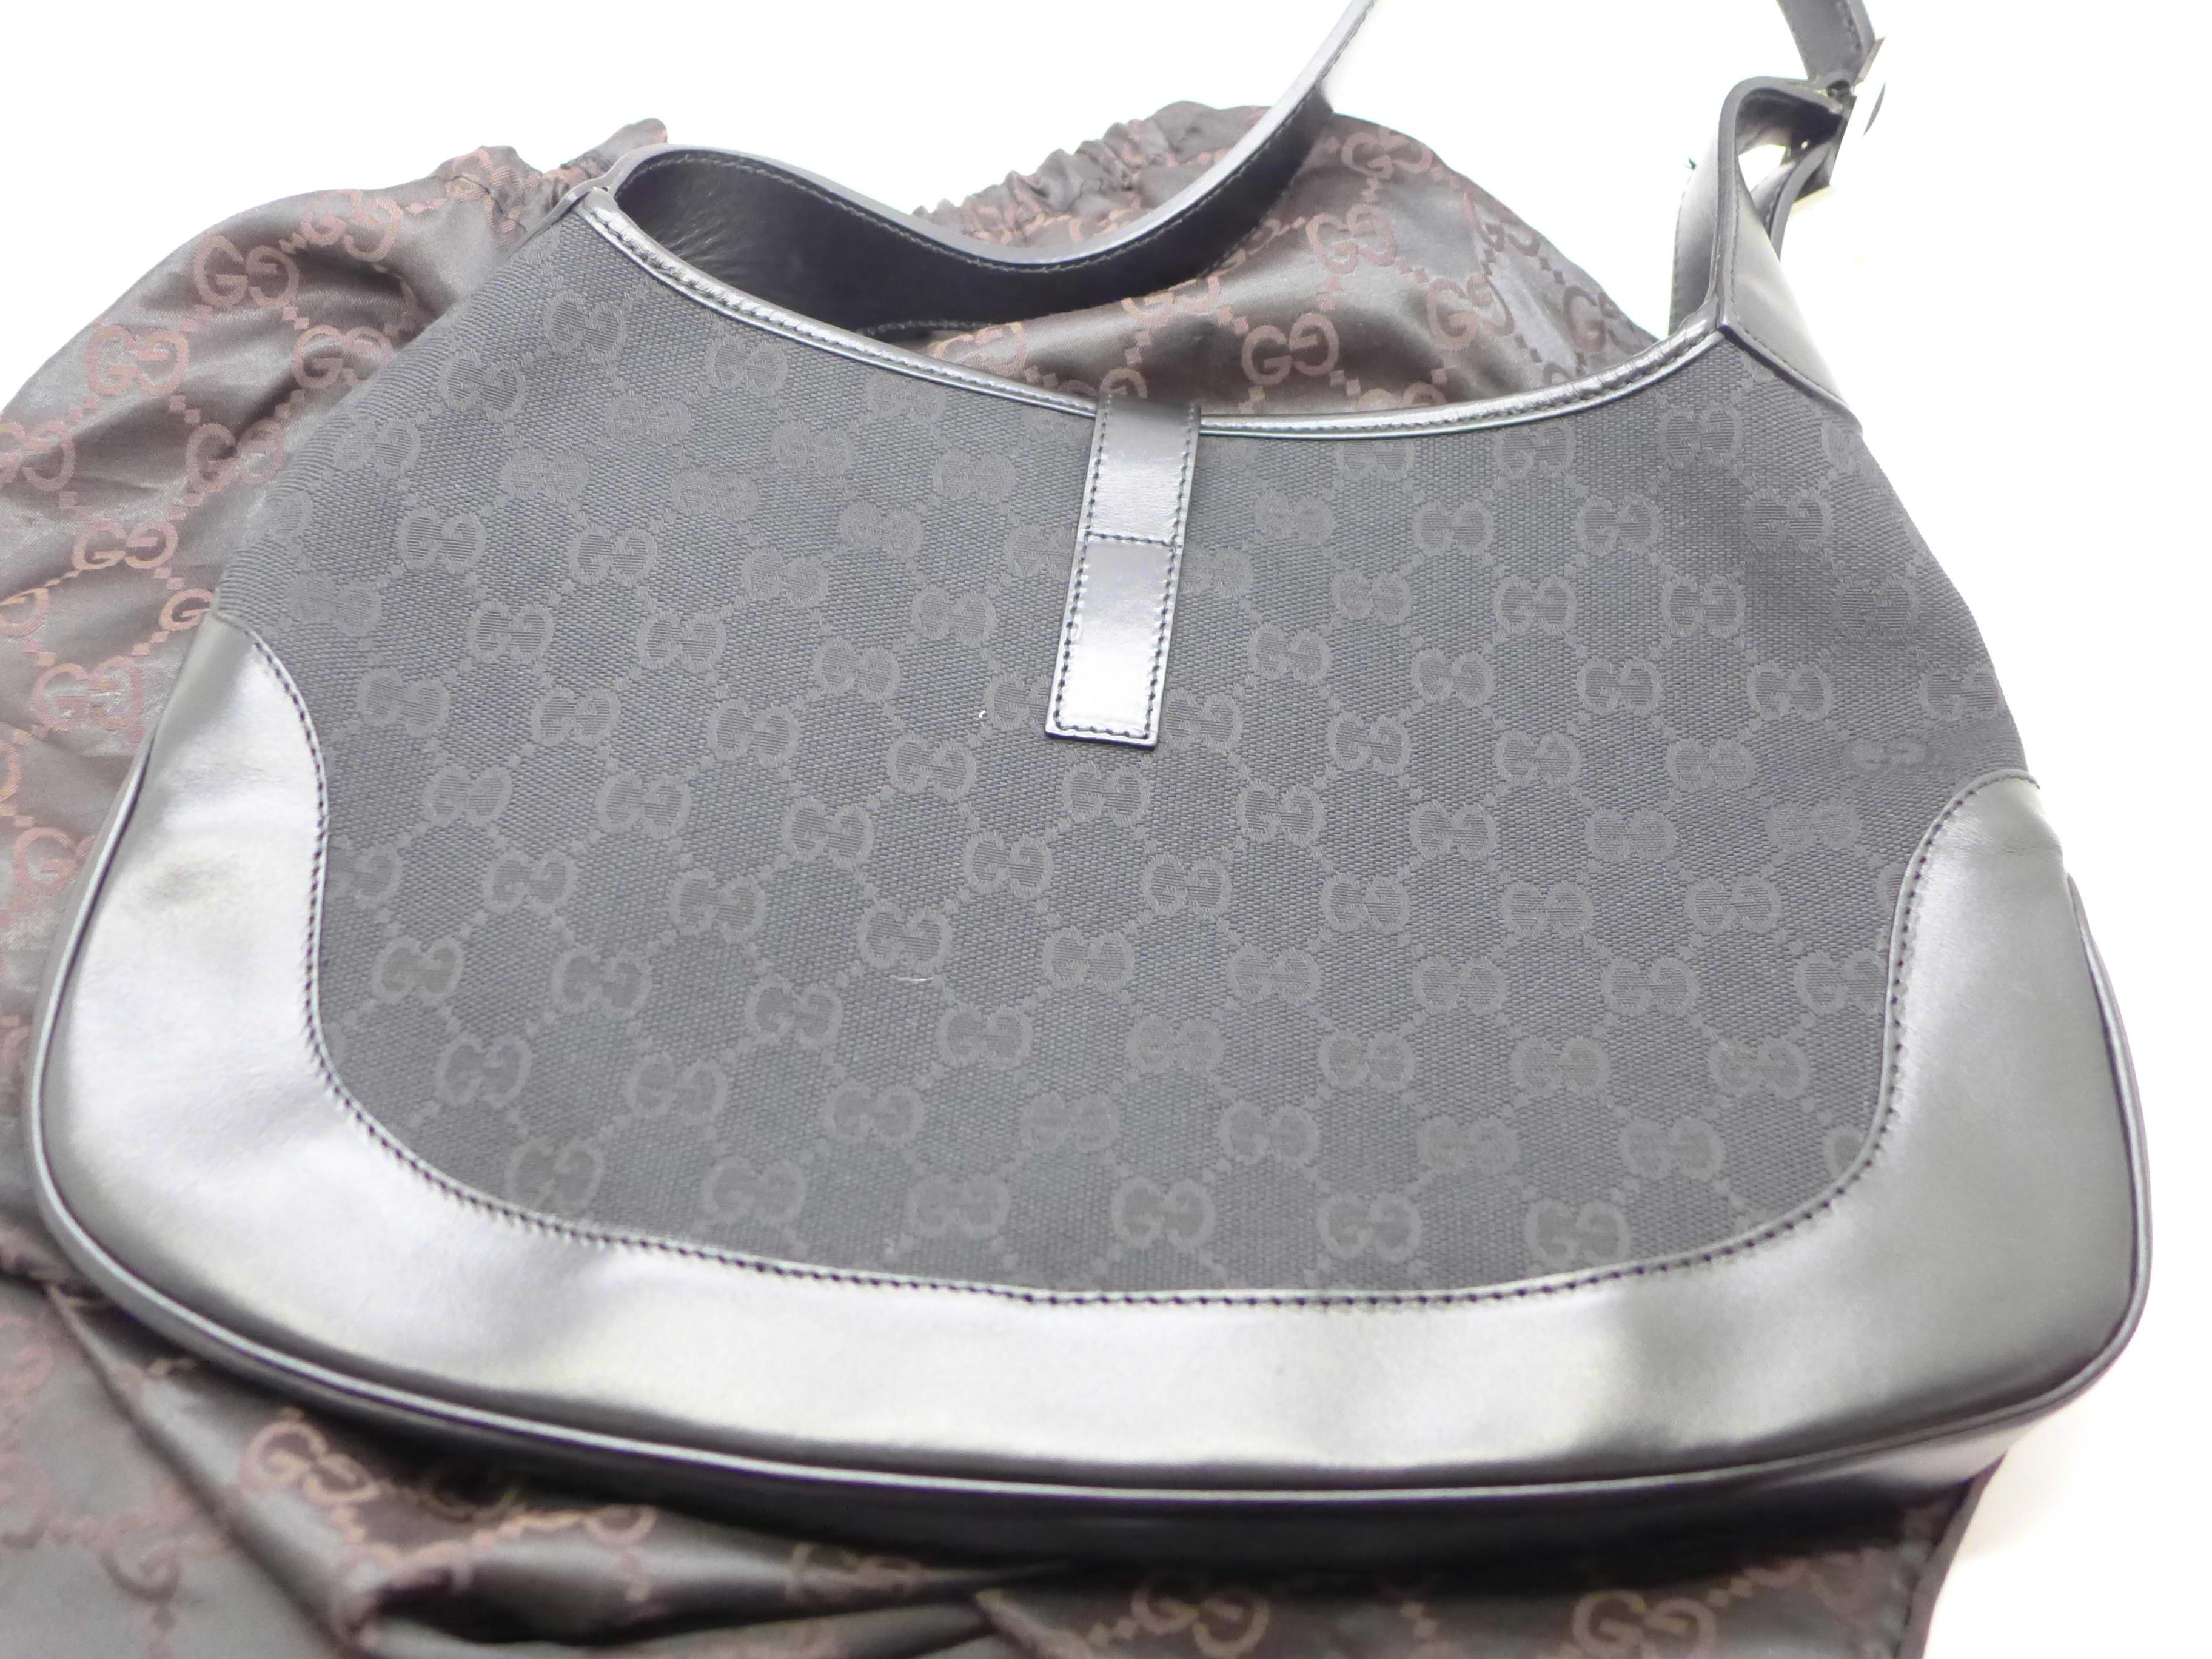 A lady's Gucci handbag - Image 2 of 4